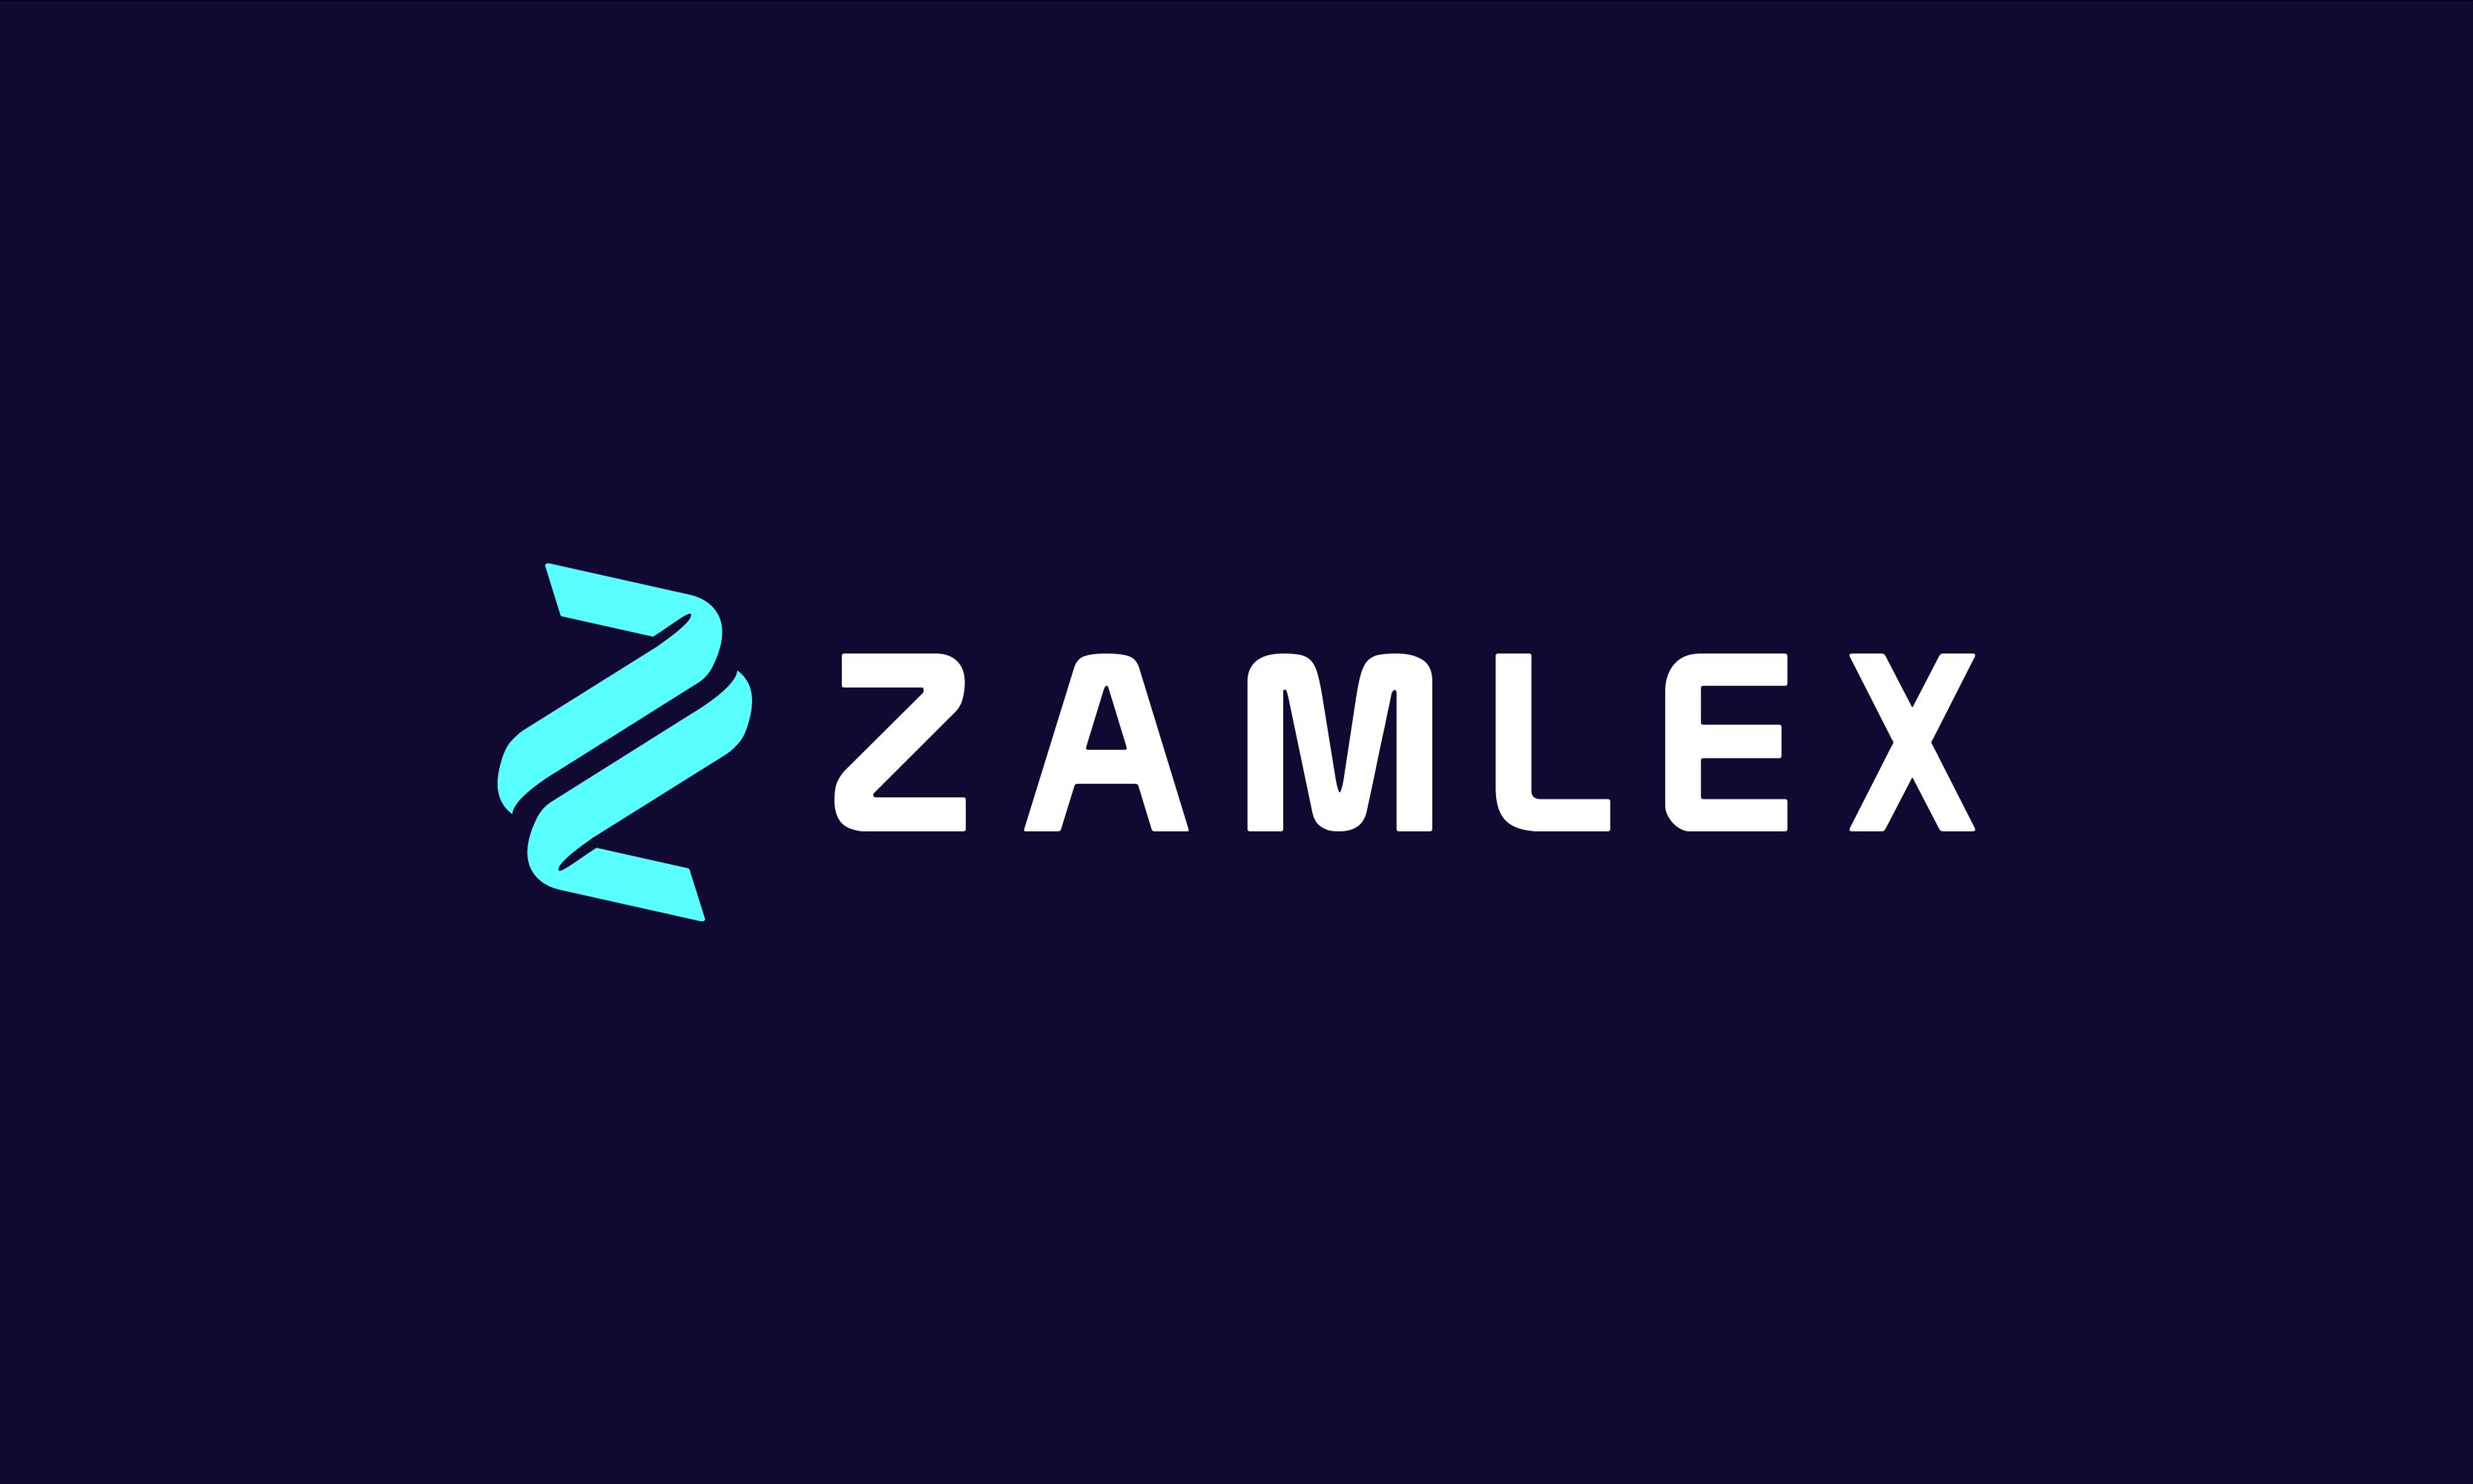 Zamlex